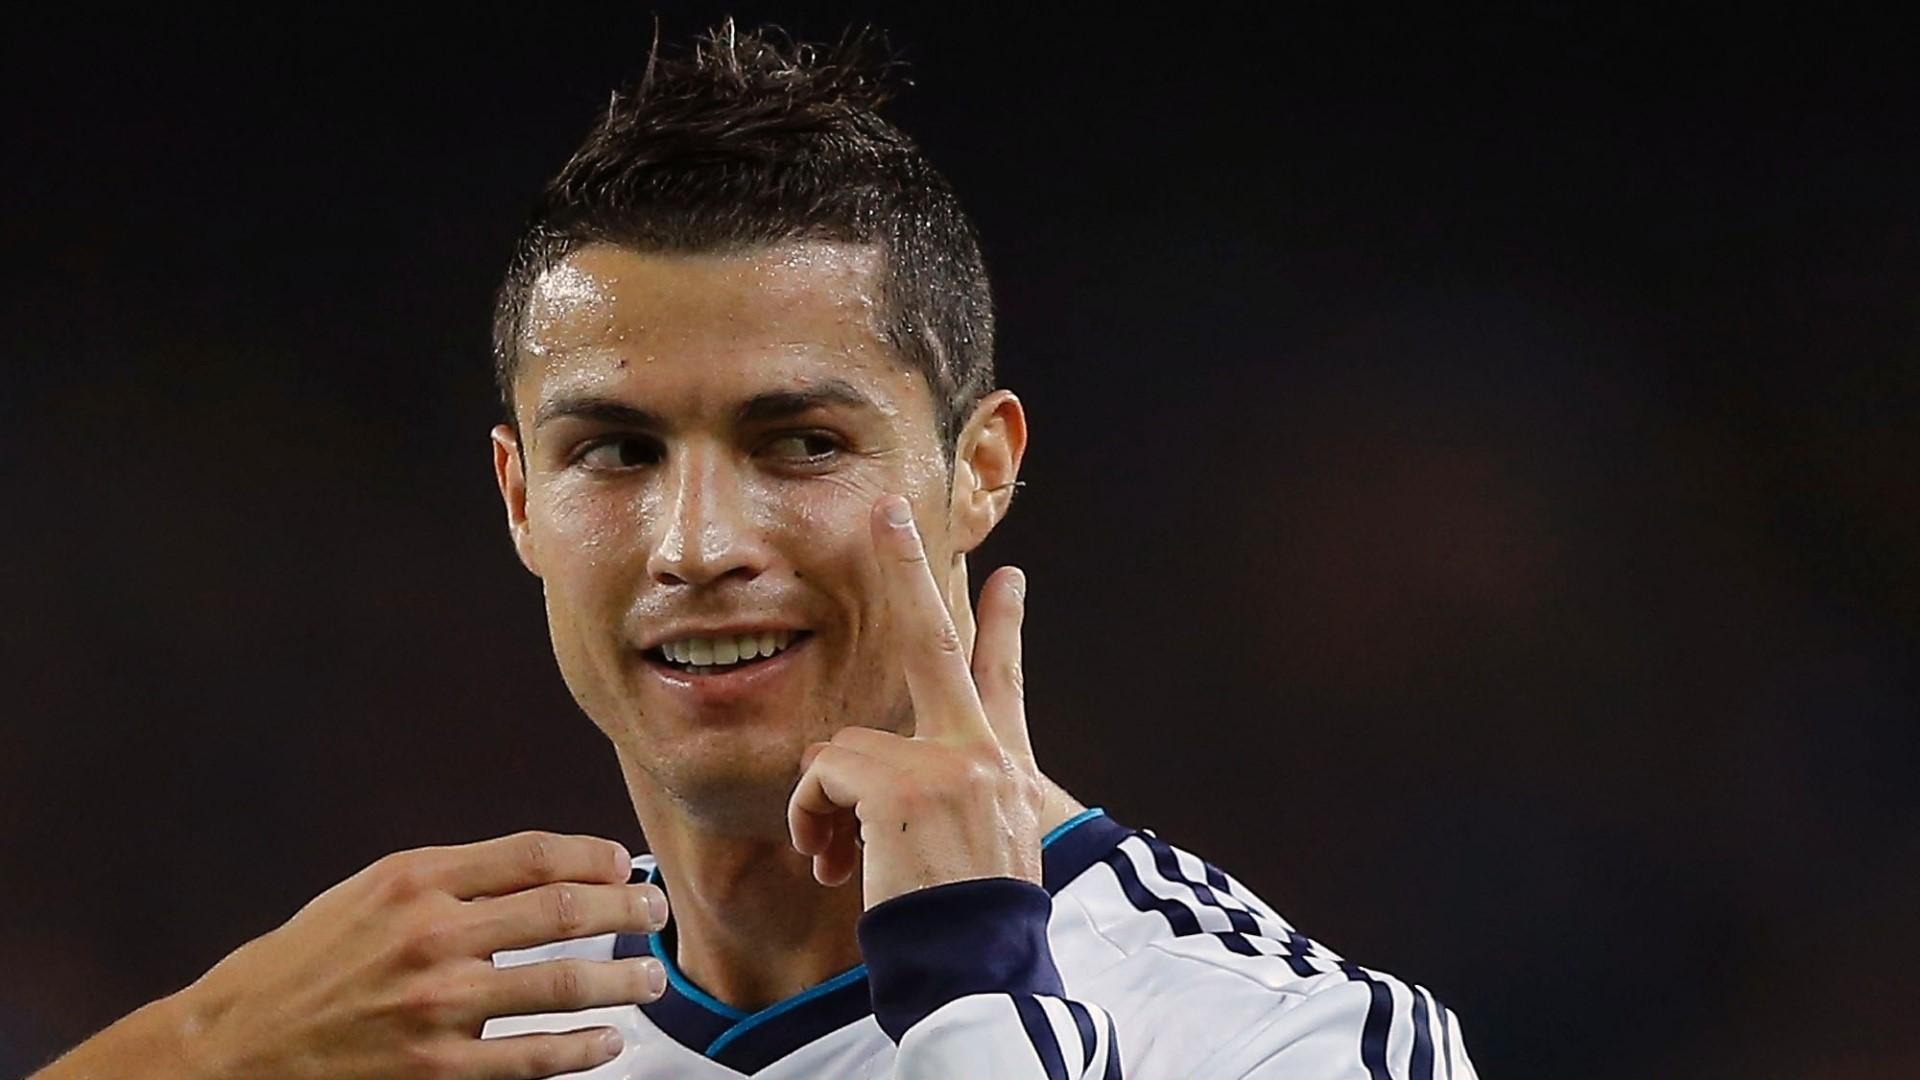 Cristiano Ronaldo Wallpapers 2